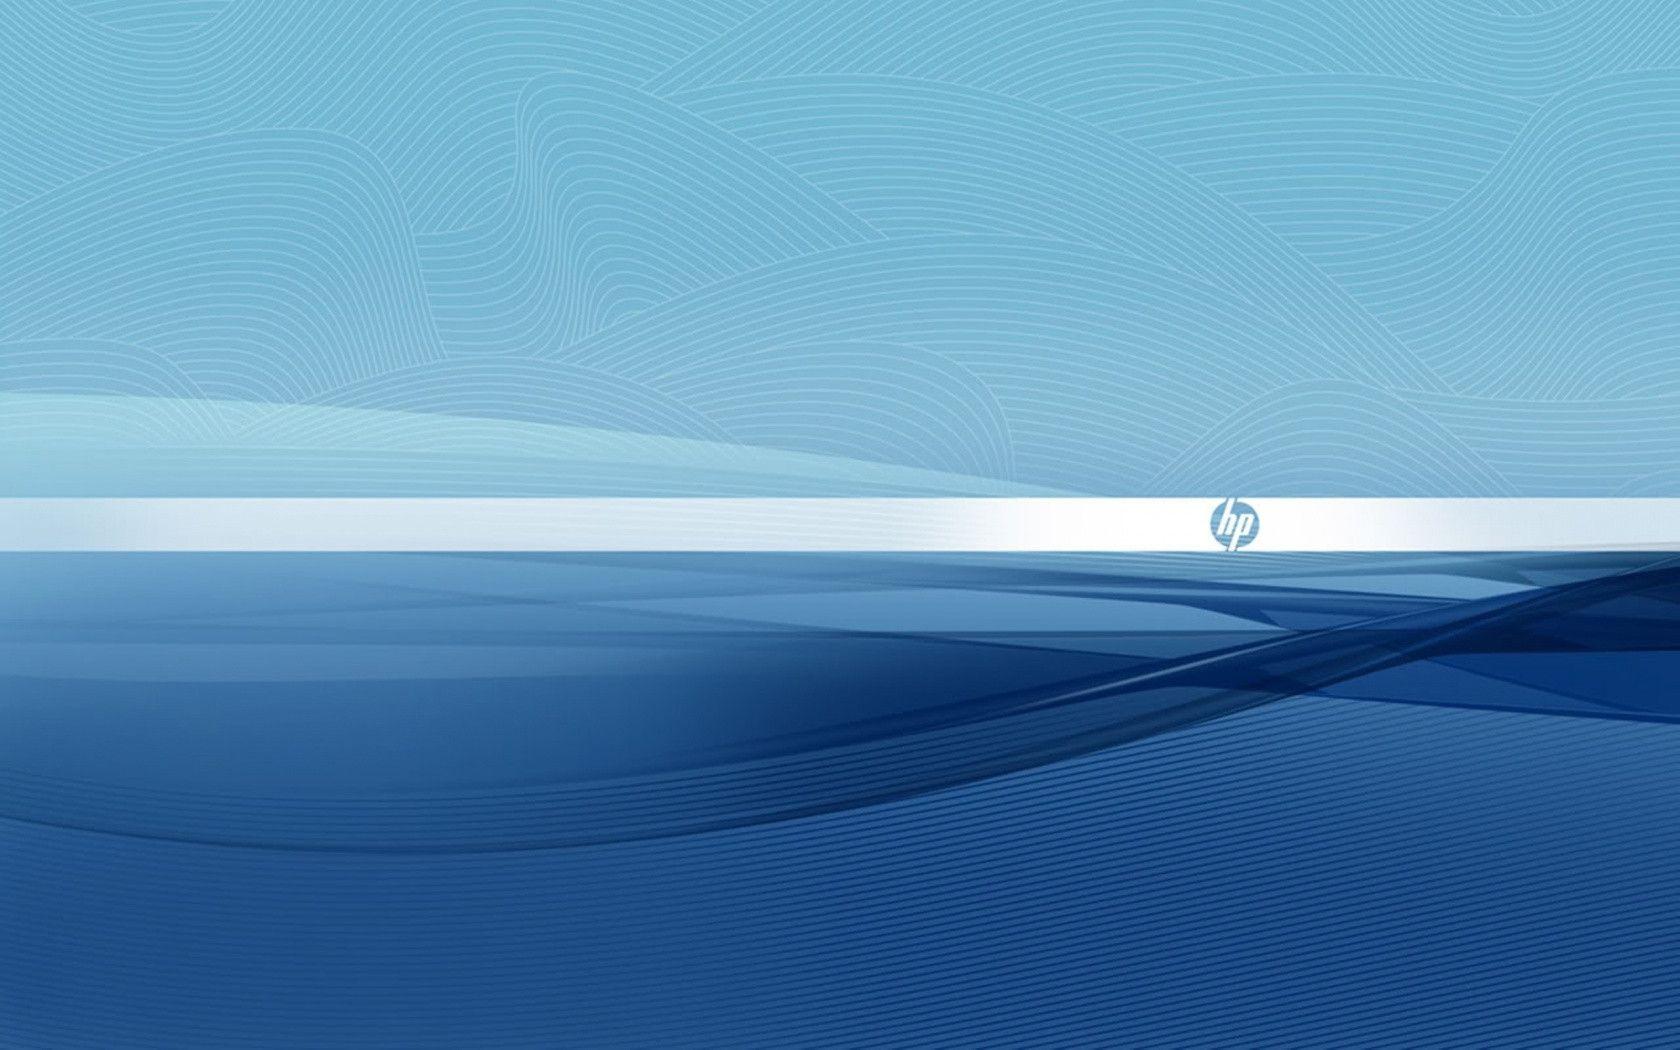 Desktop Backgrounds For HP Group (83+)